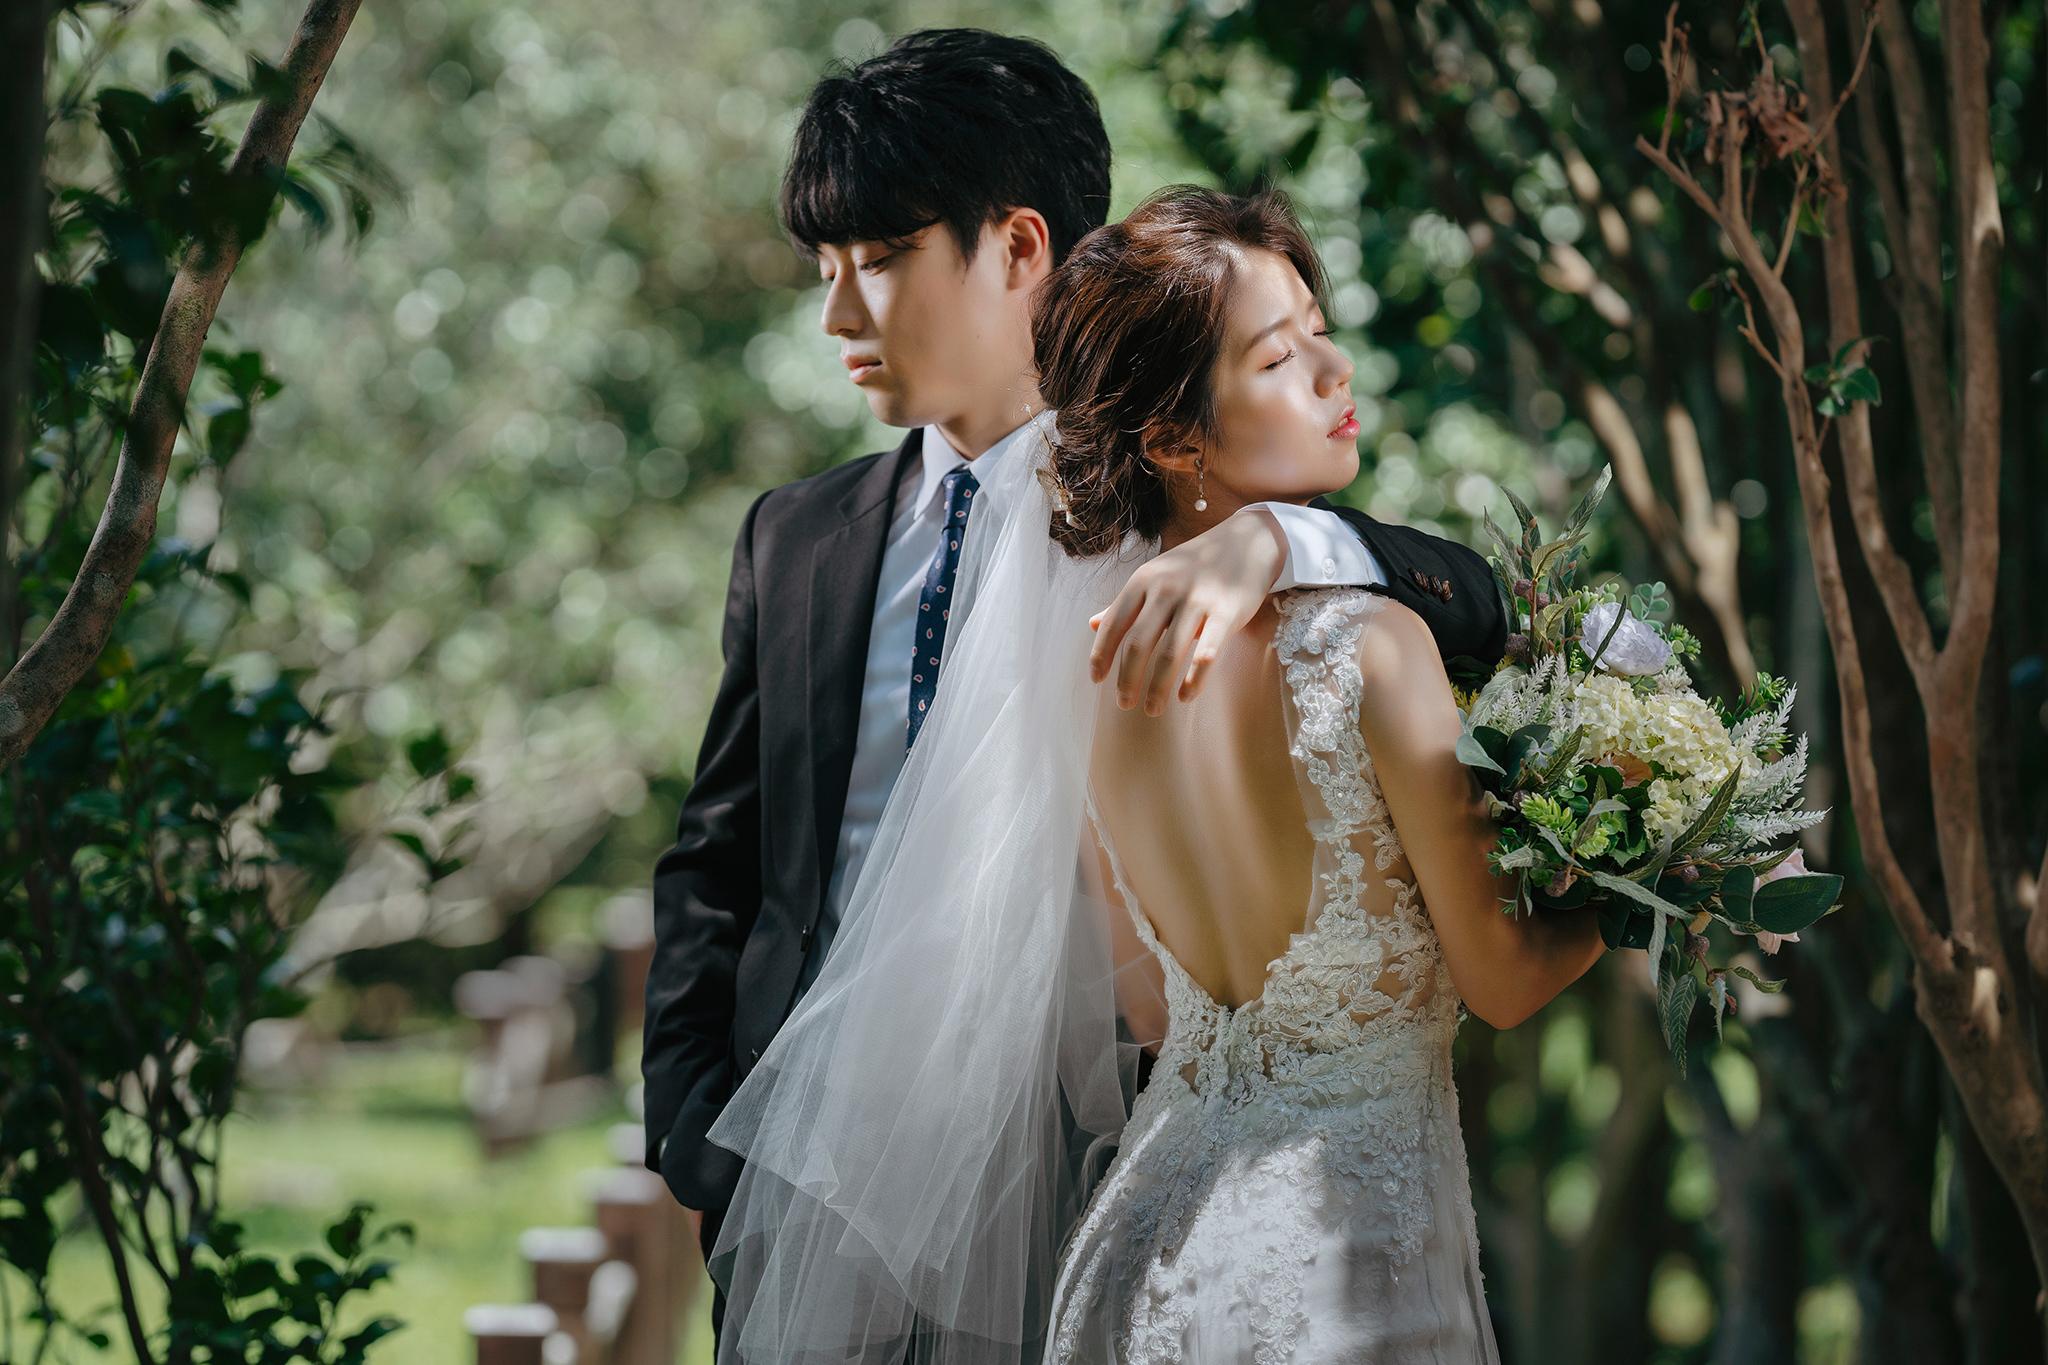 Donfer, EASTERN WEDDING, 台灣婚紗, 東法婚紗